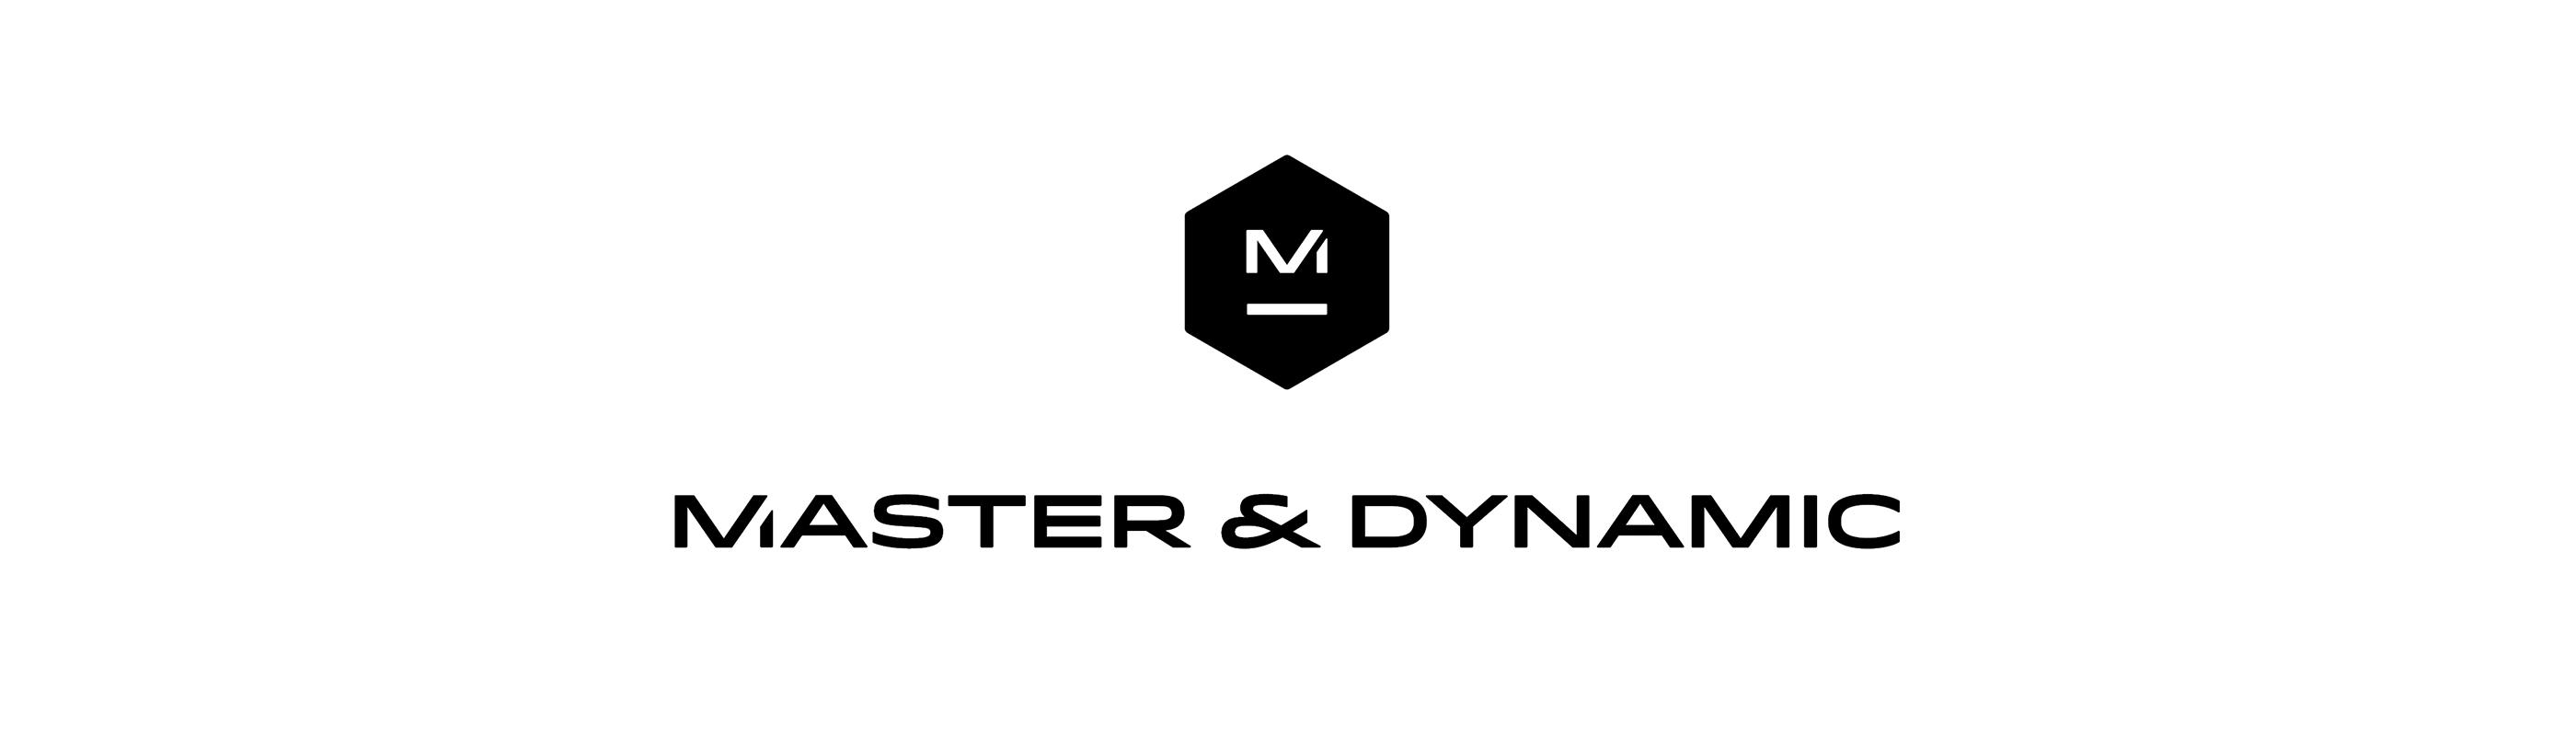 MASTER&DYNAMIC